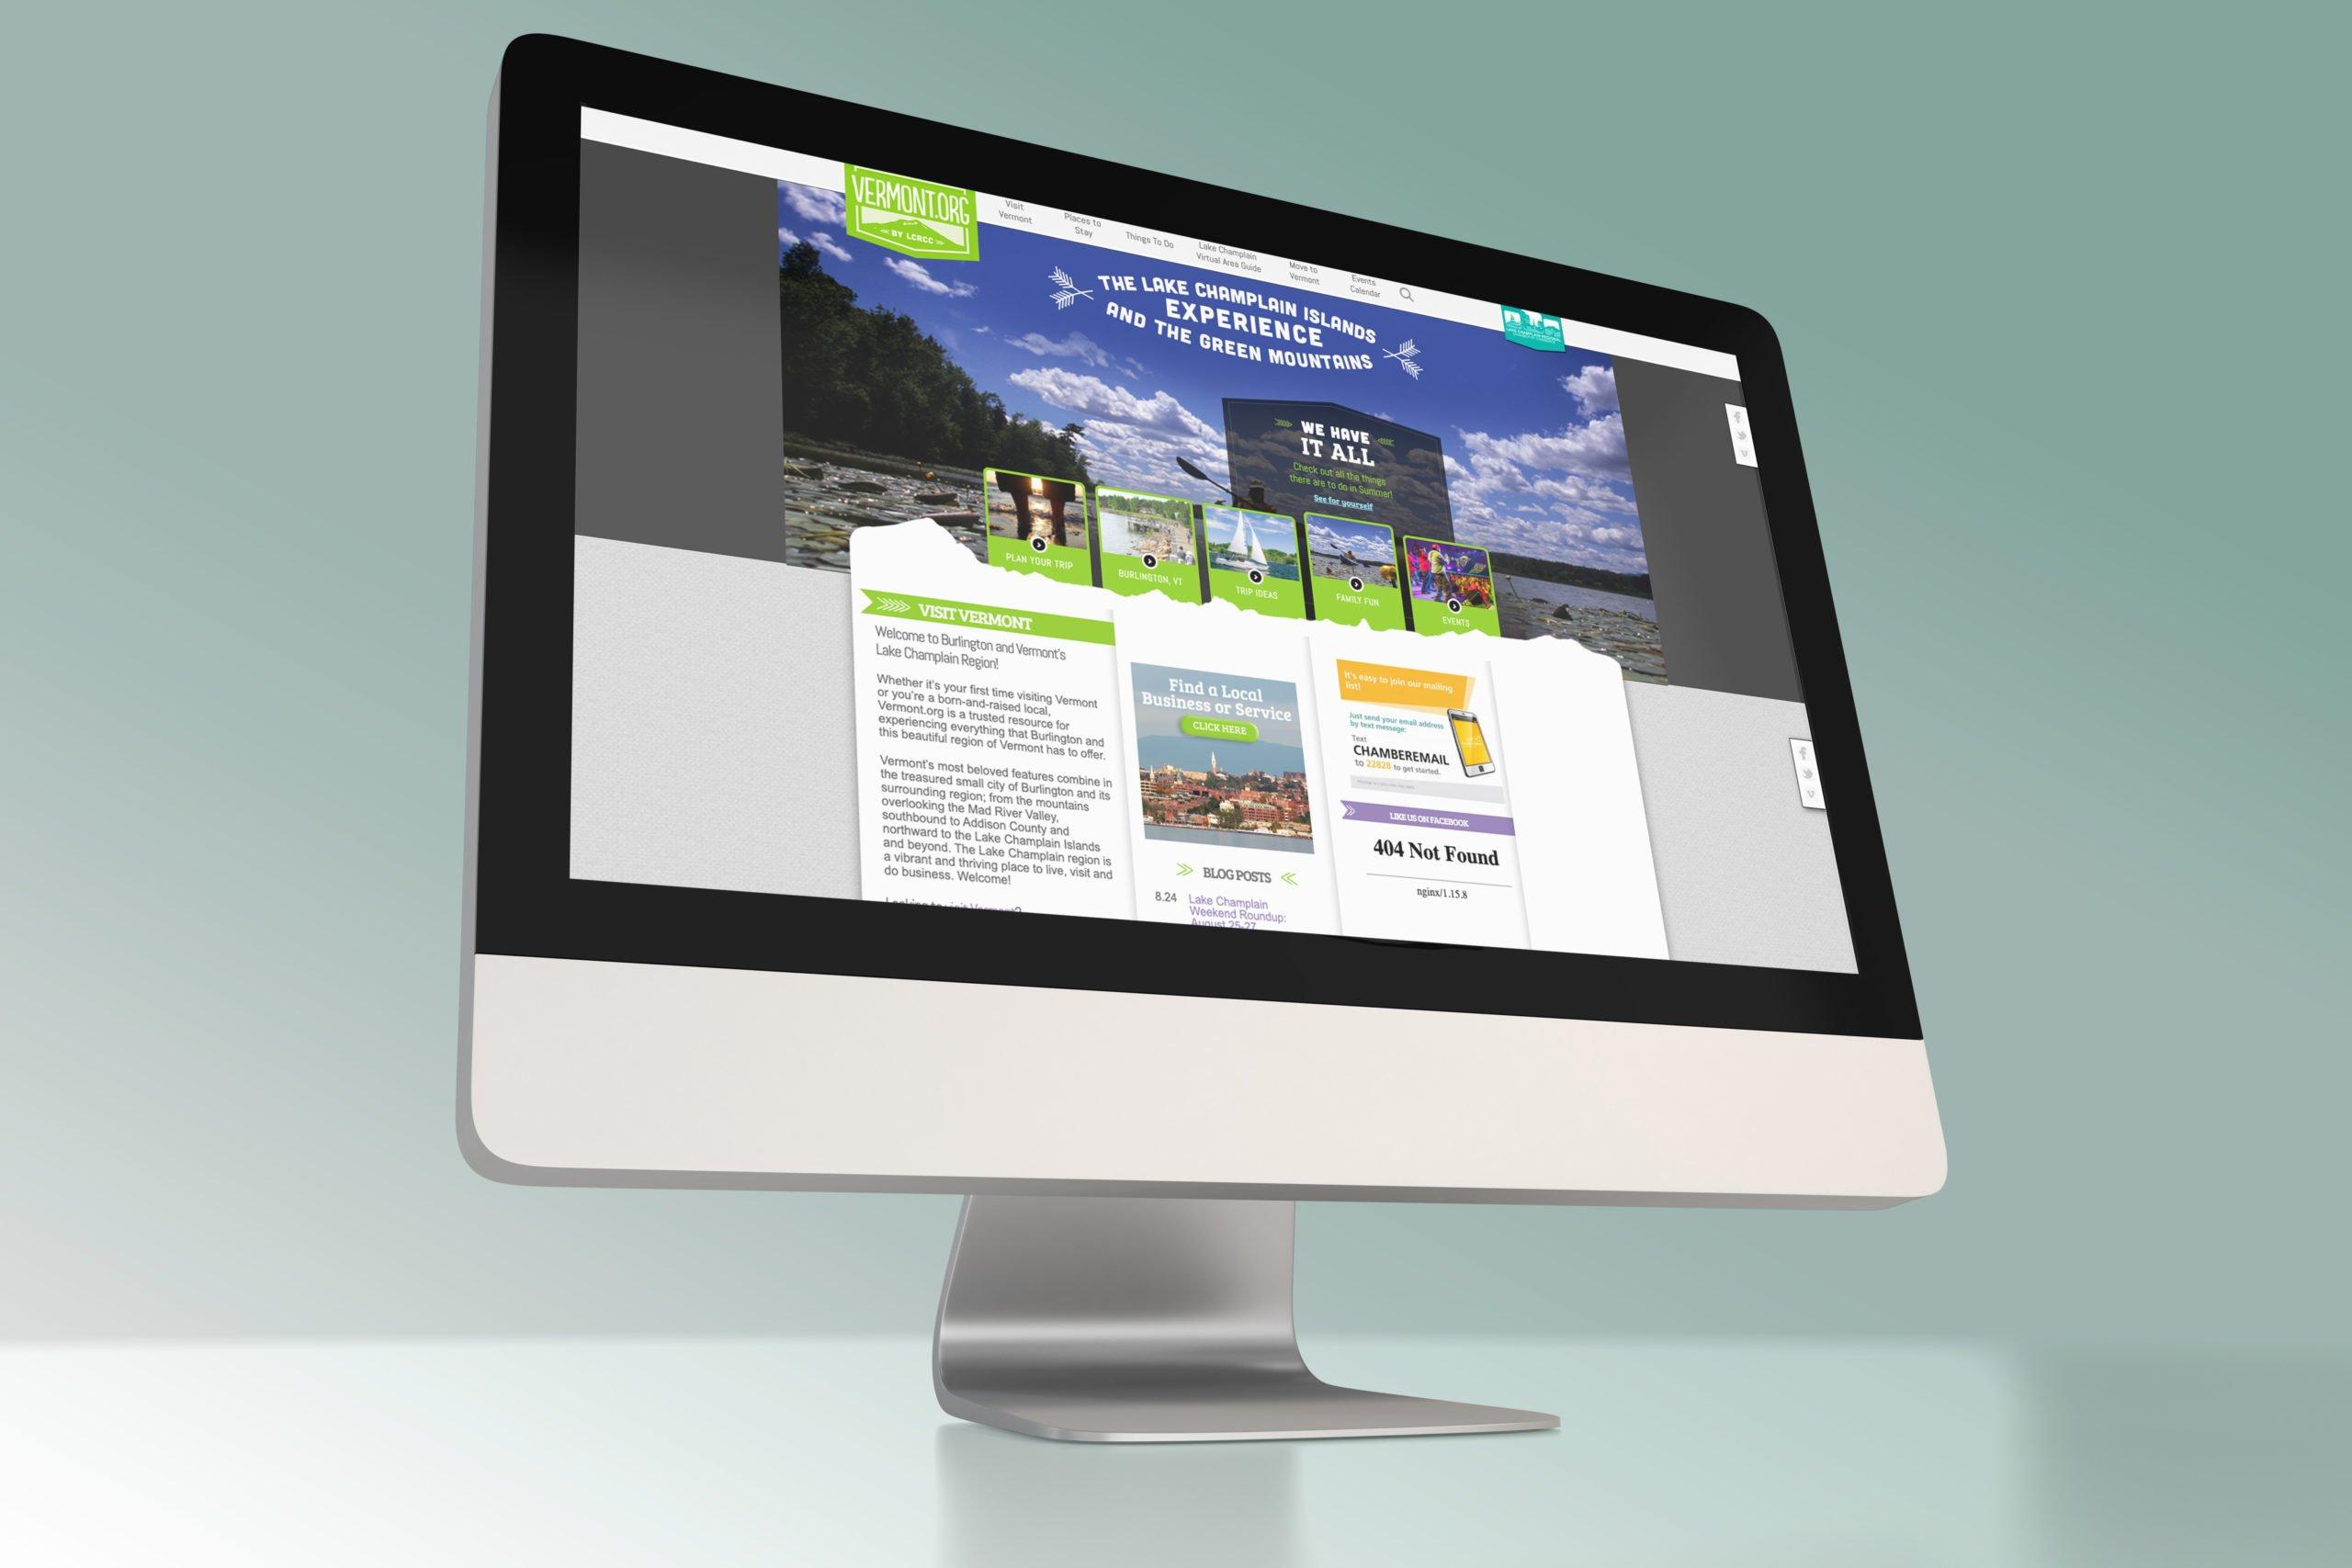 vermont.org's old website on desktop